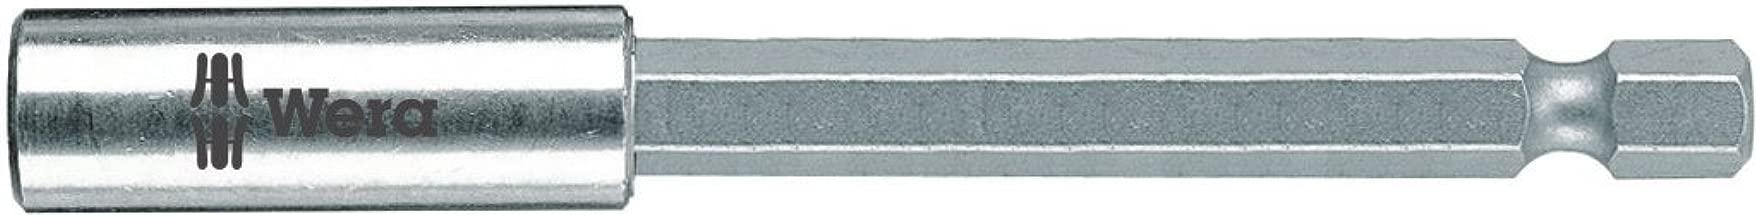 Wera Hexagon 899/4/1 Stainless Steel Sleeve, Universal Bit Holder 1/4